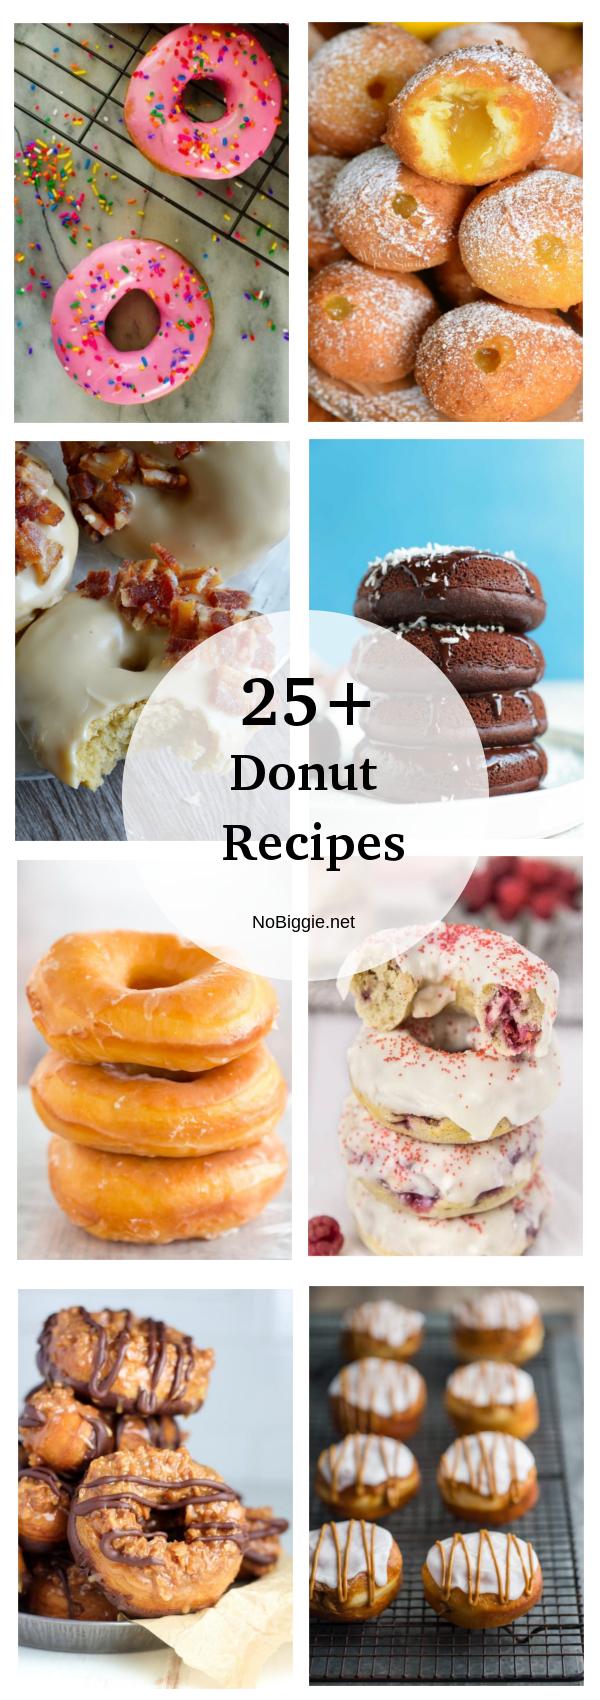 25+ Donut Recipes | NoBiggie.net